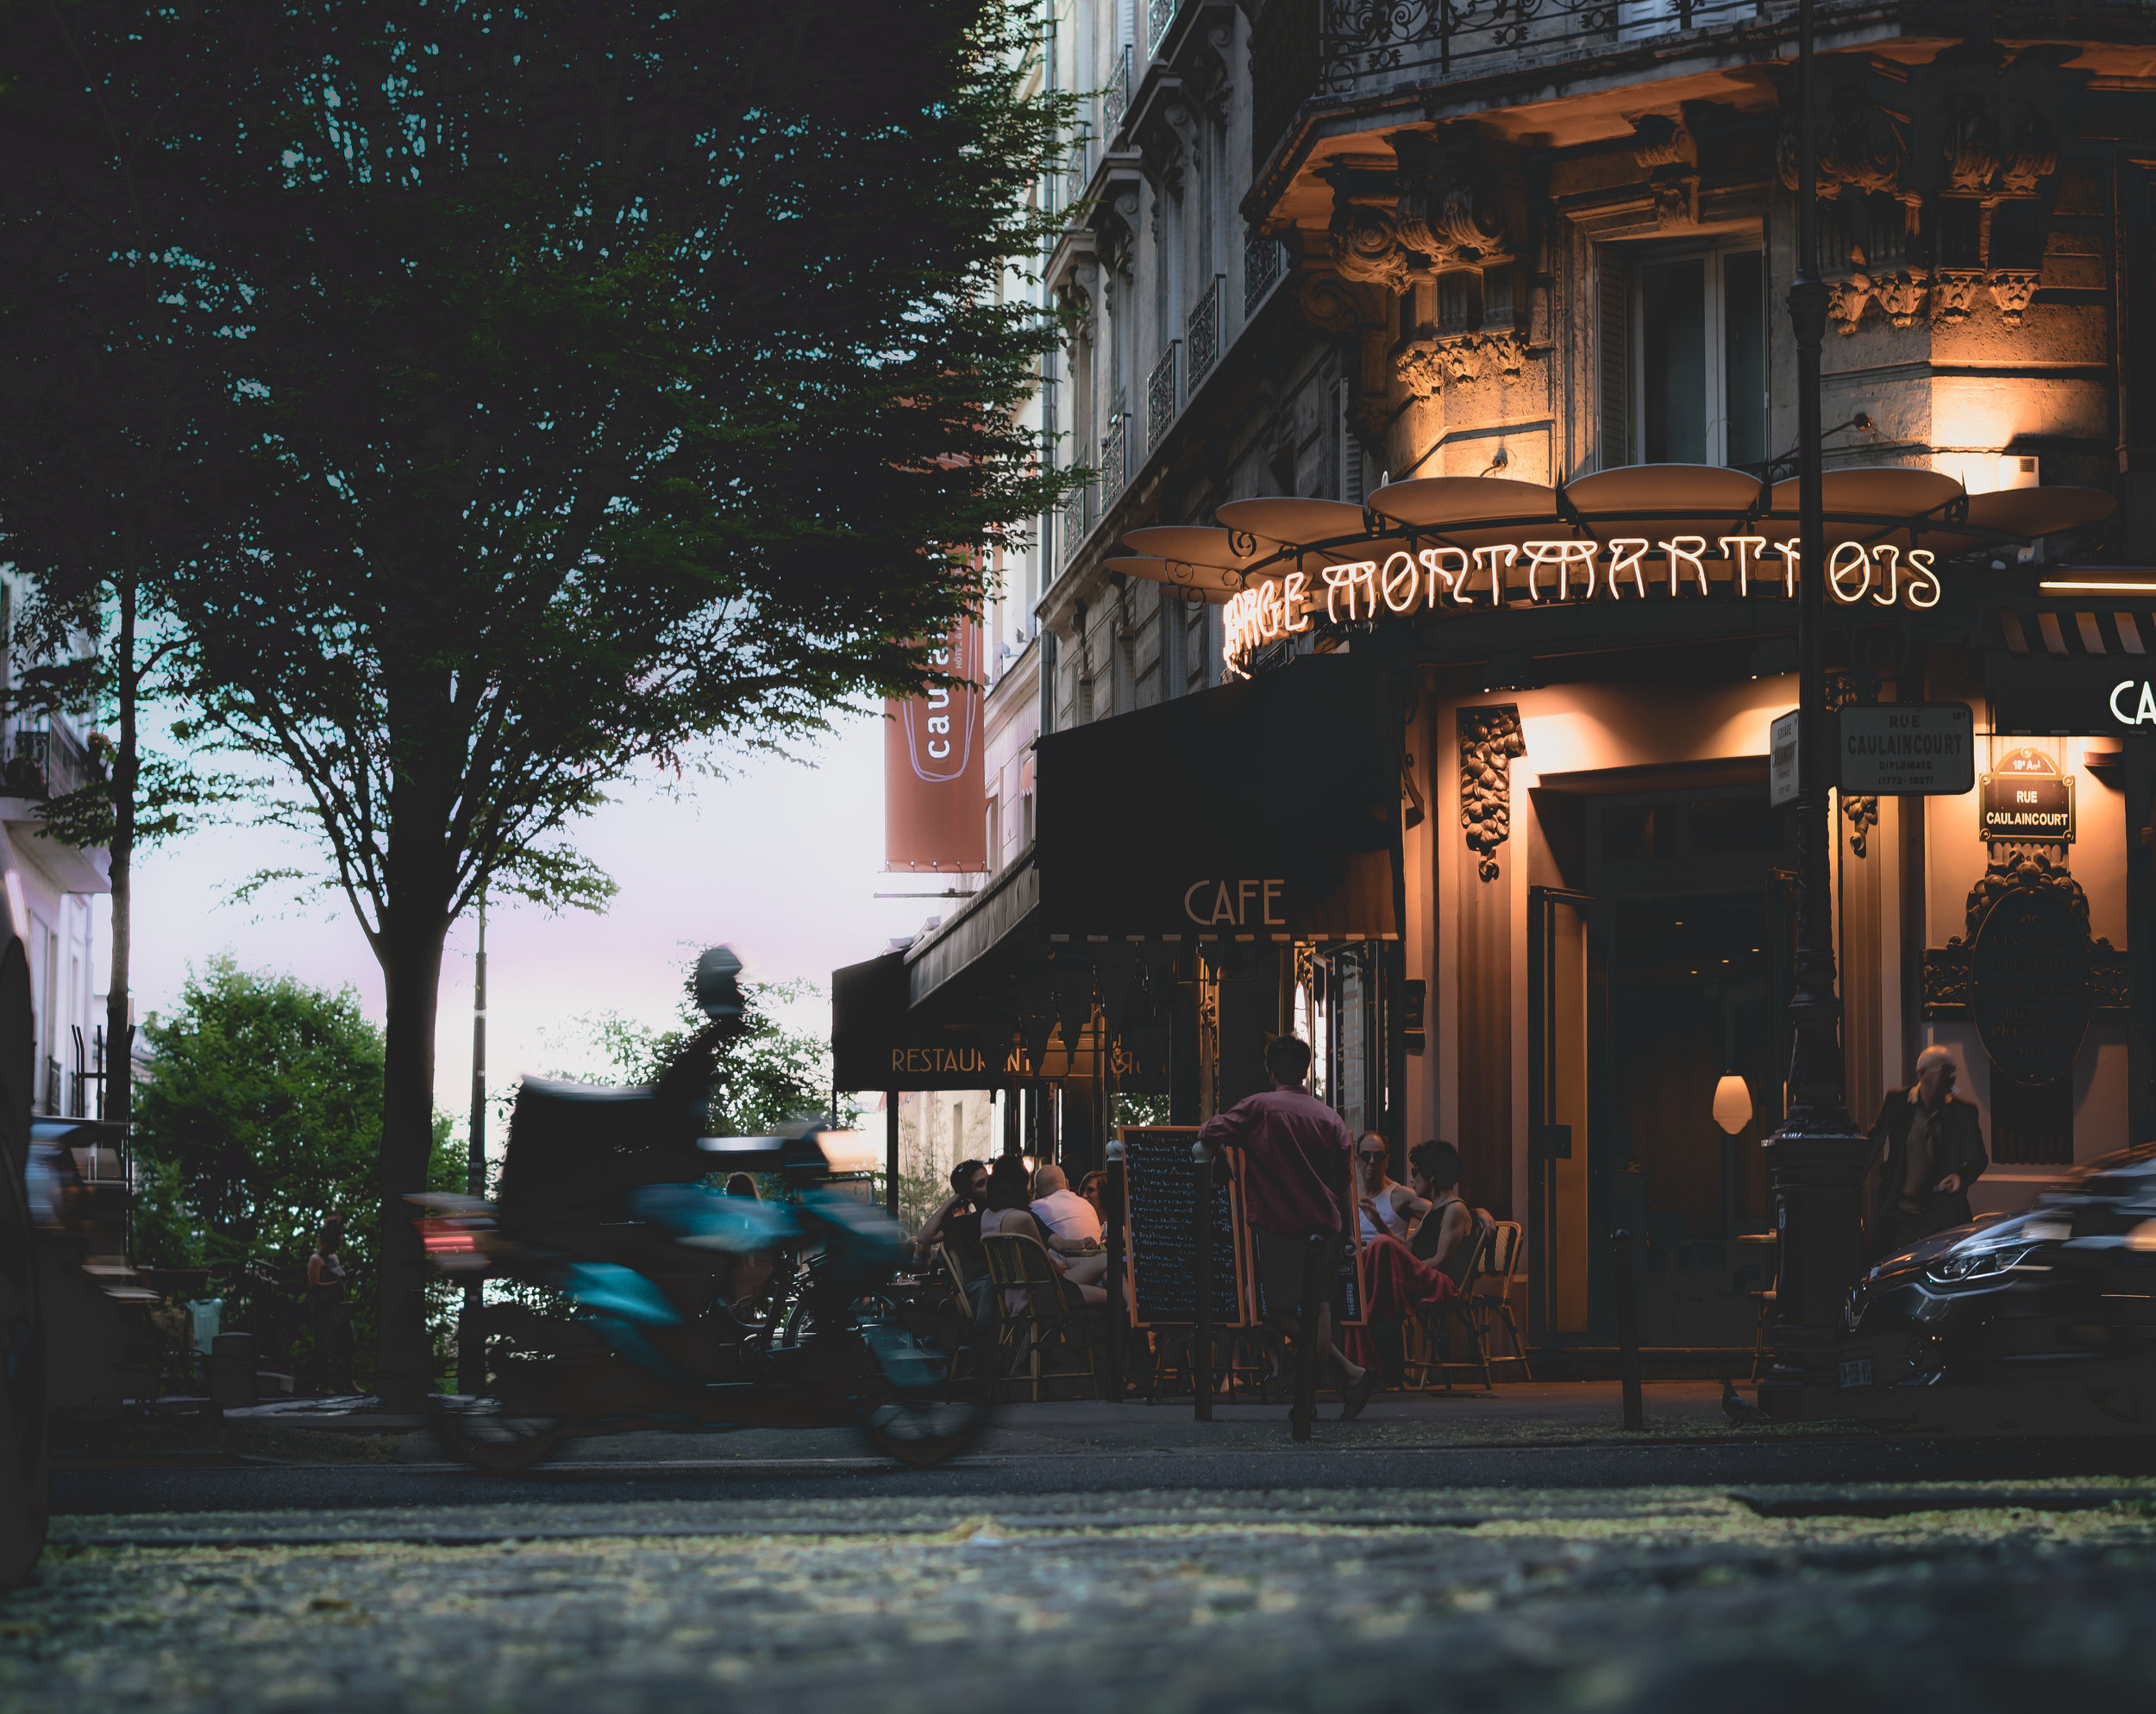 Cafe in Montmartre.jpg